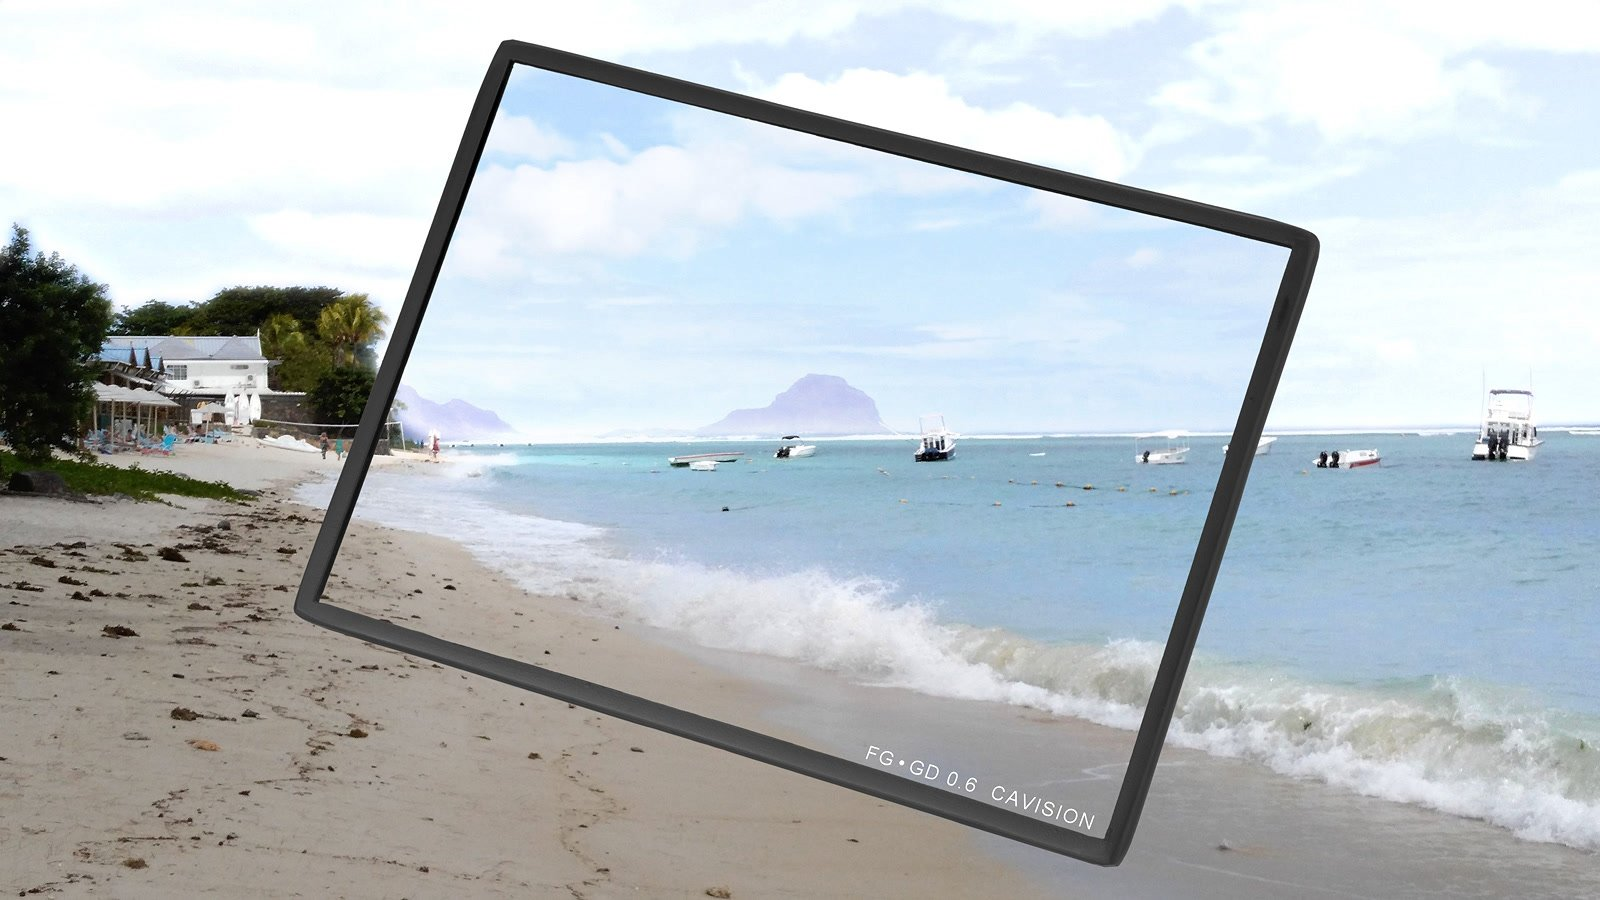 Cavision 4x5.65 Graduated ND / ND Verlauf Filter 0.6 (FTG4X565GD06) Foto Nr. 4